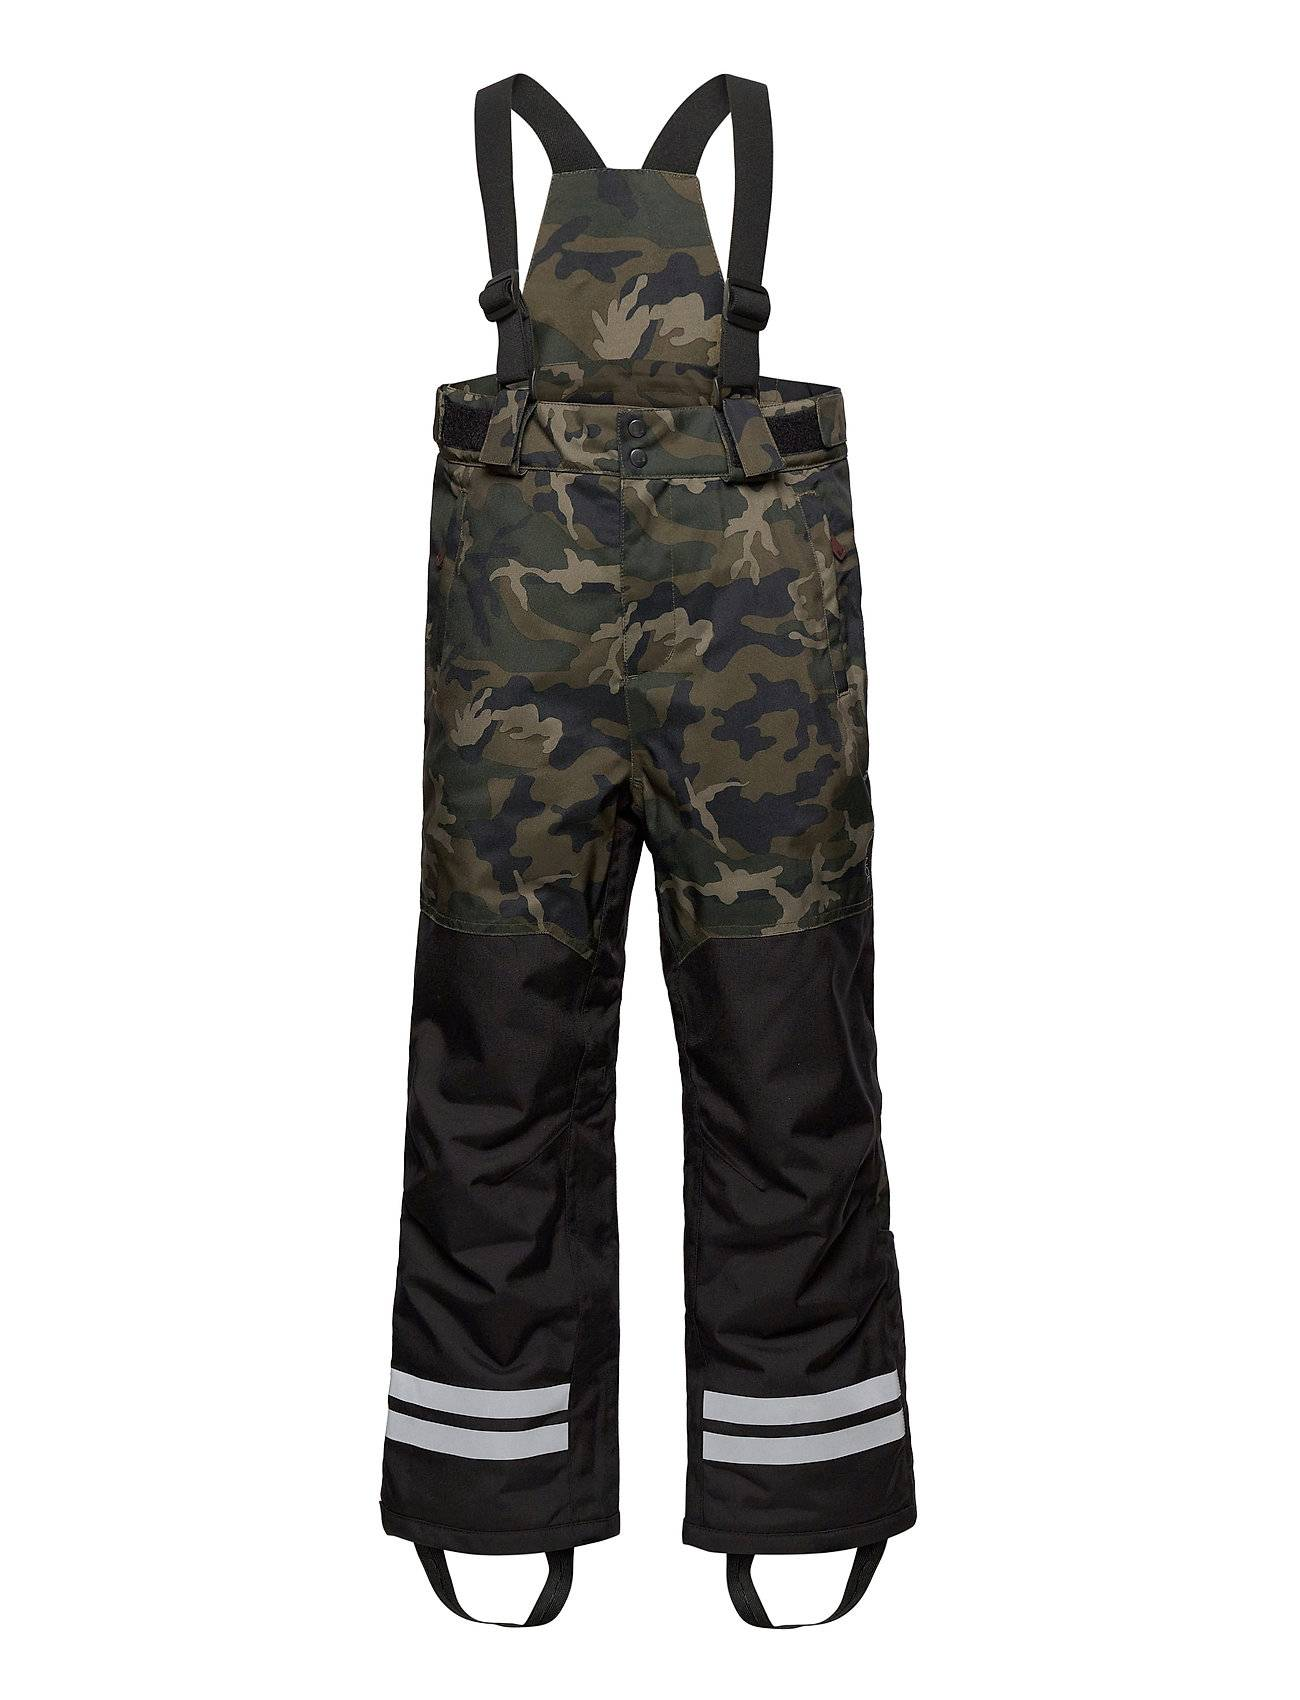 Lindberg Sweden Camo Pants Outerwear Snow/ski Clothing Snow/ski Pants Vihreä Lindberg Sweden